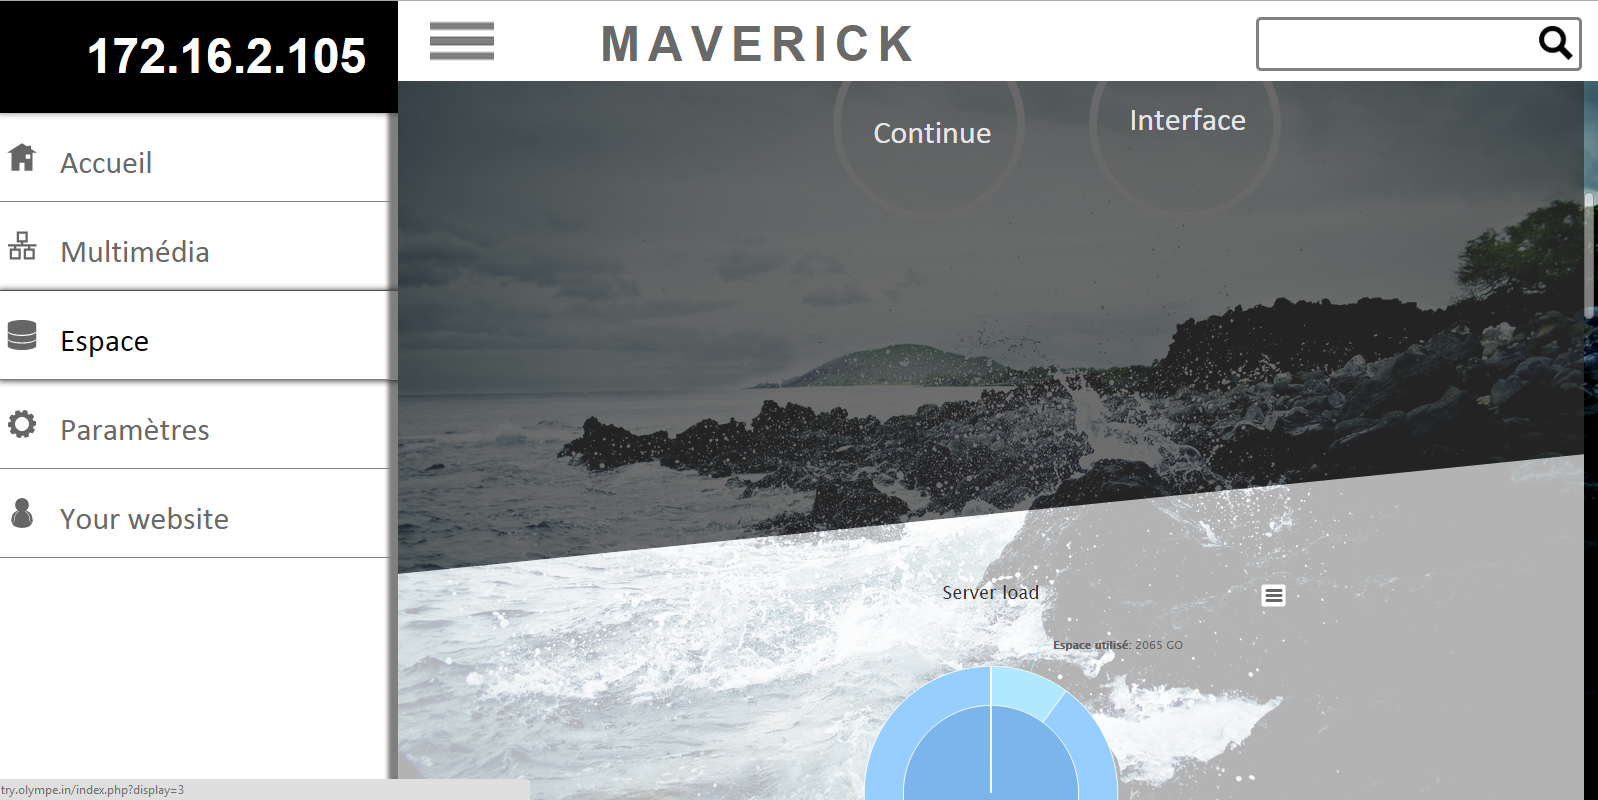 Maverick - Cloud storage website - 4